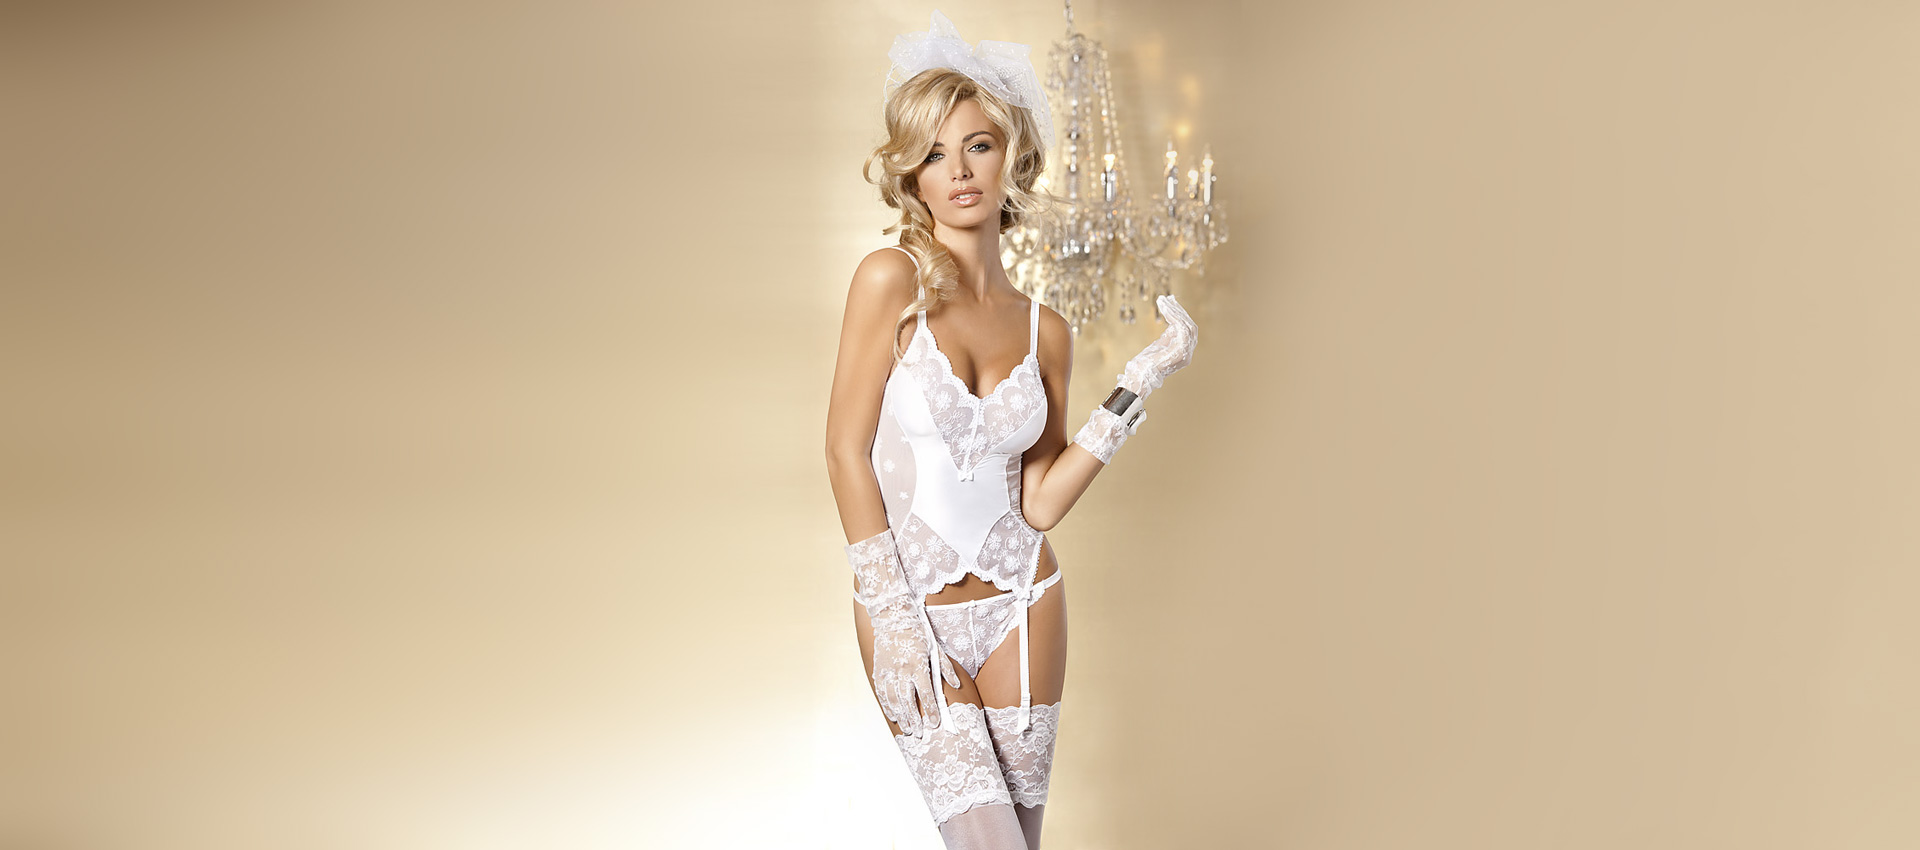 MERRY ME corset + G-string